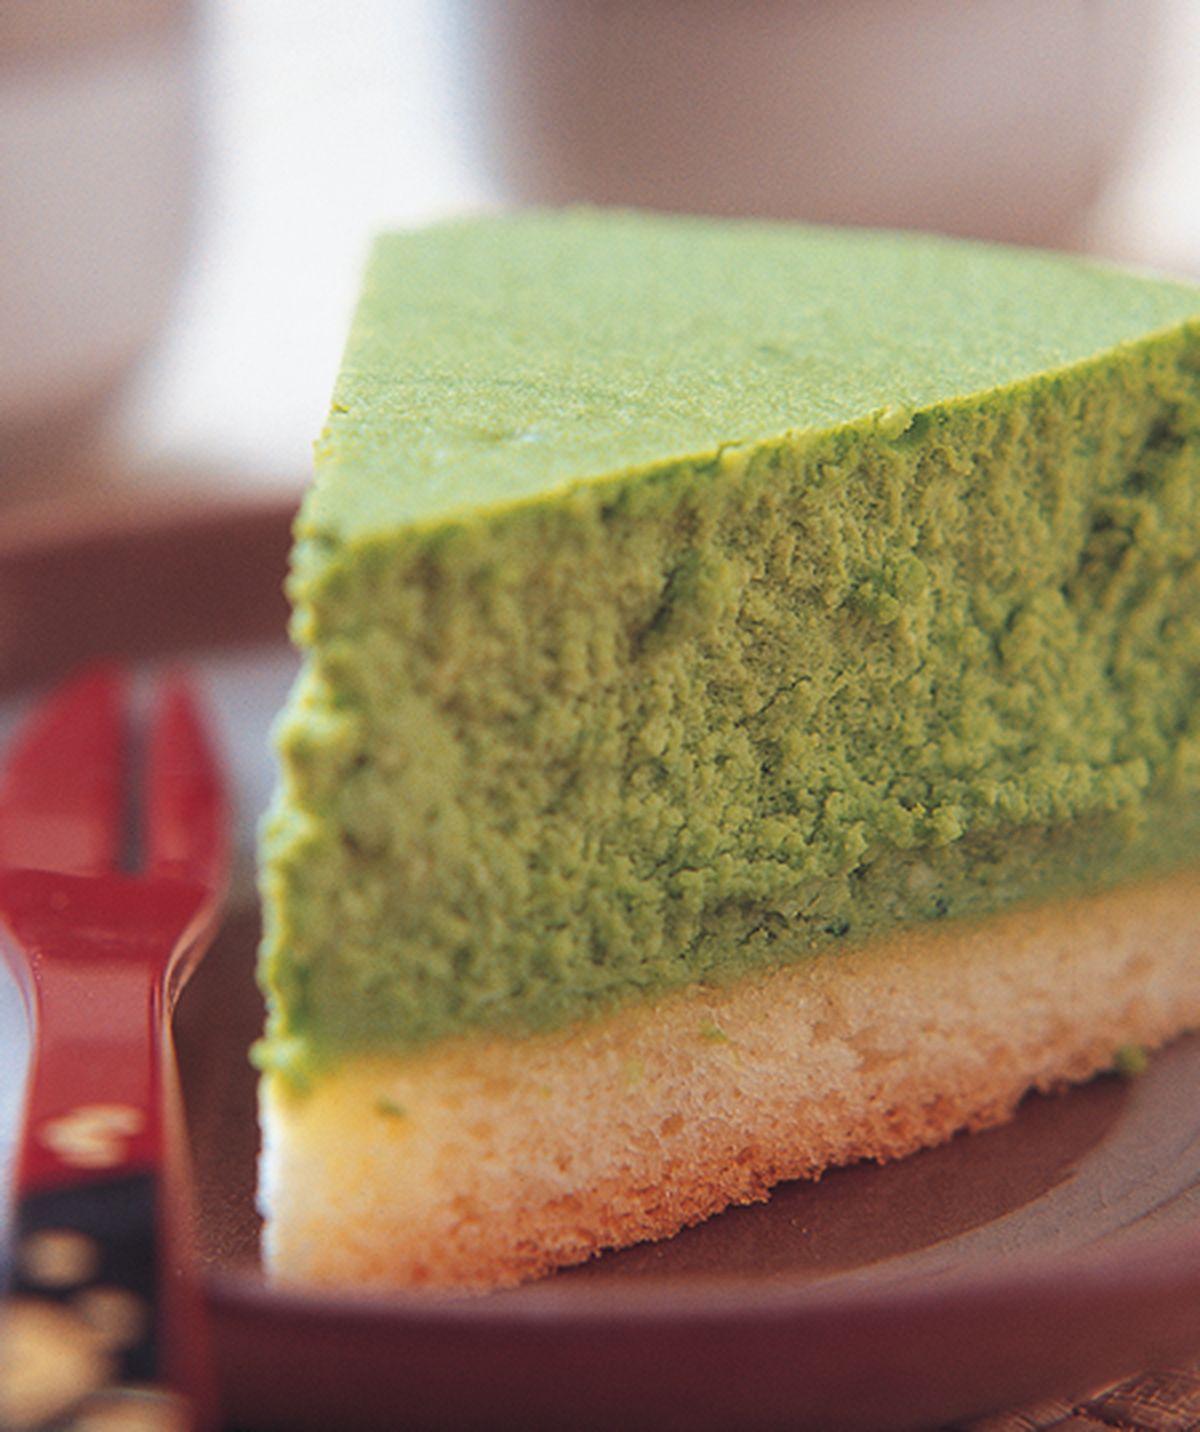 【食譜】抹茶乳酪蛋糕:www.ytower.com.tw